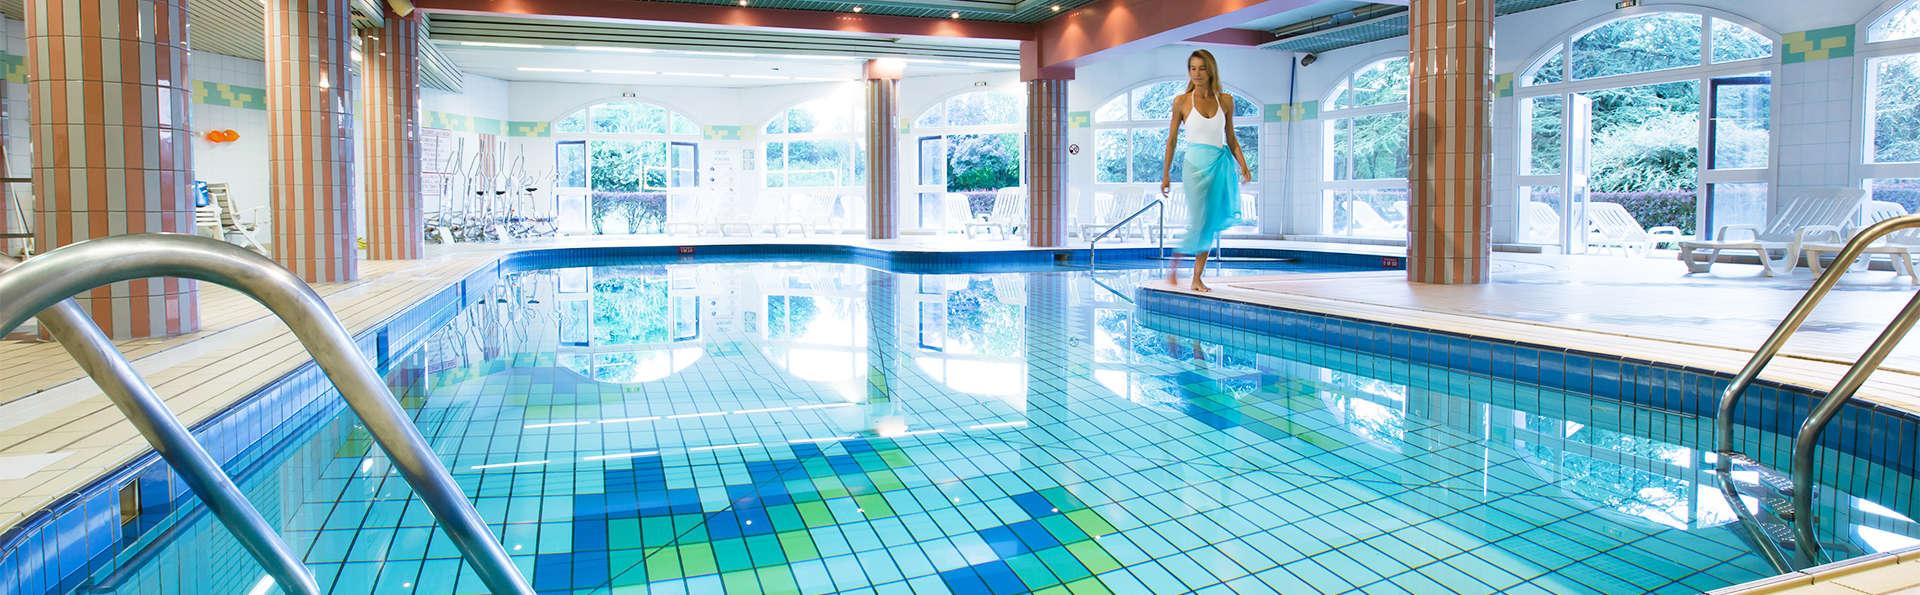 Hôtel Vacances Bleues Villa Marlioz - EDIT_pool2.jpg